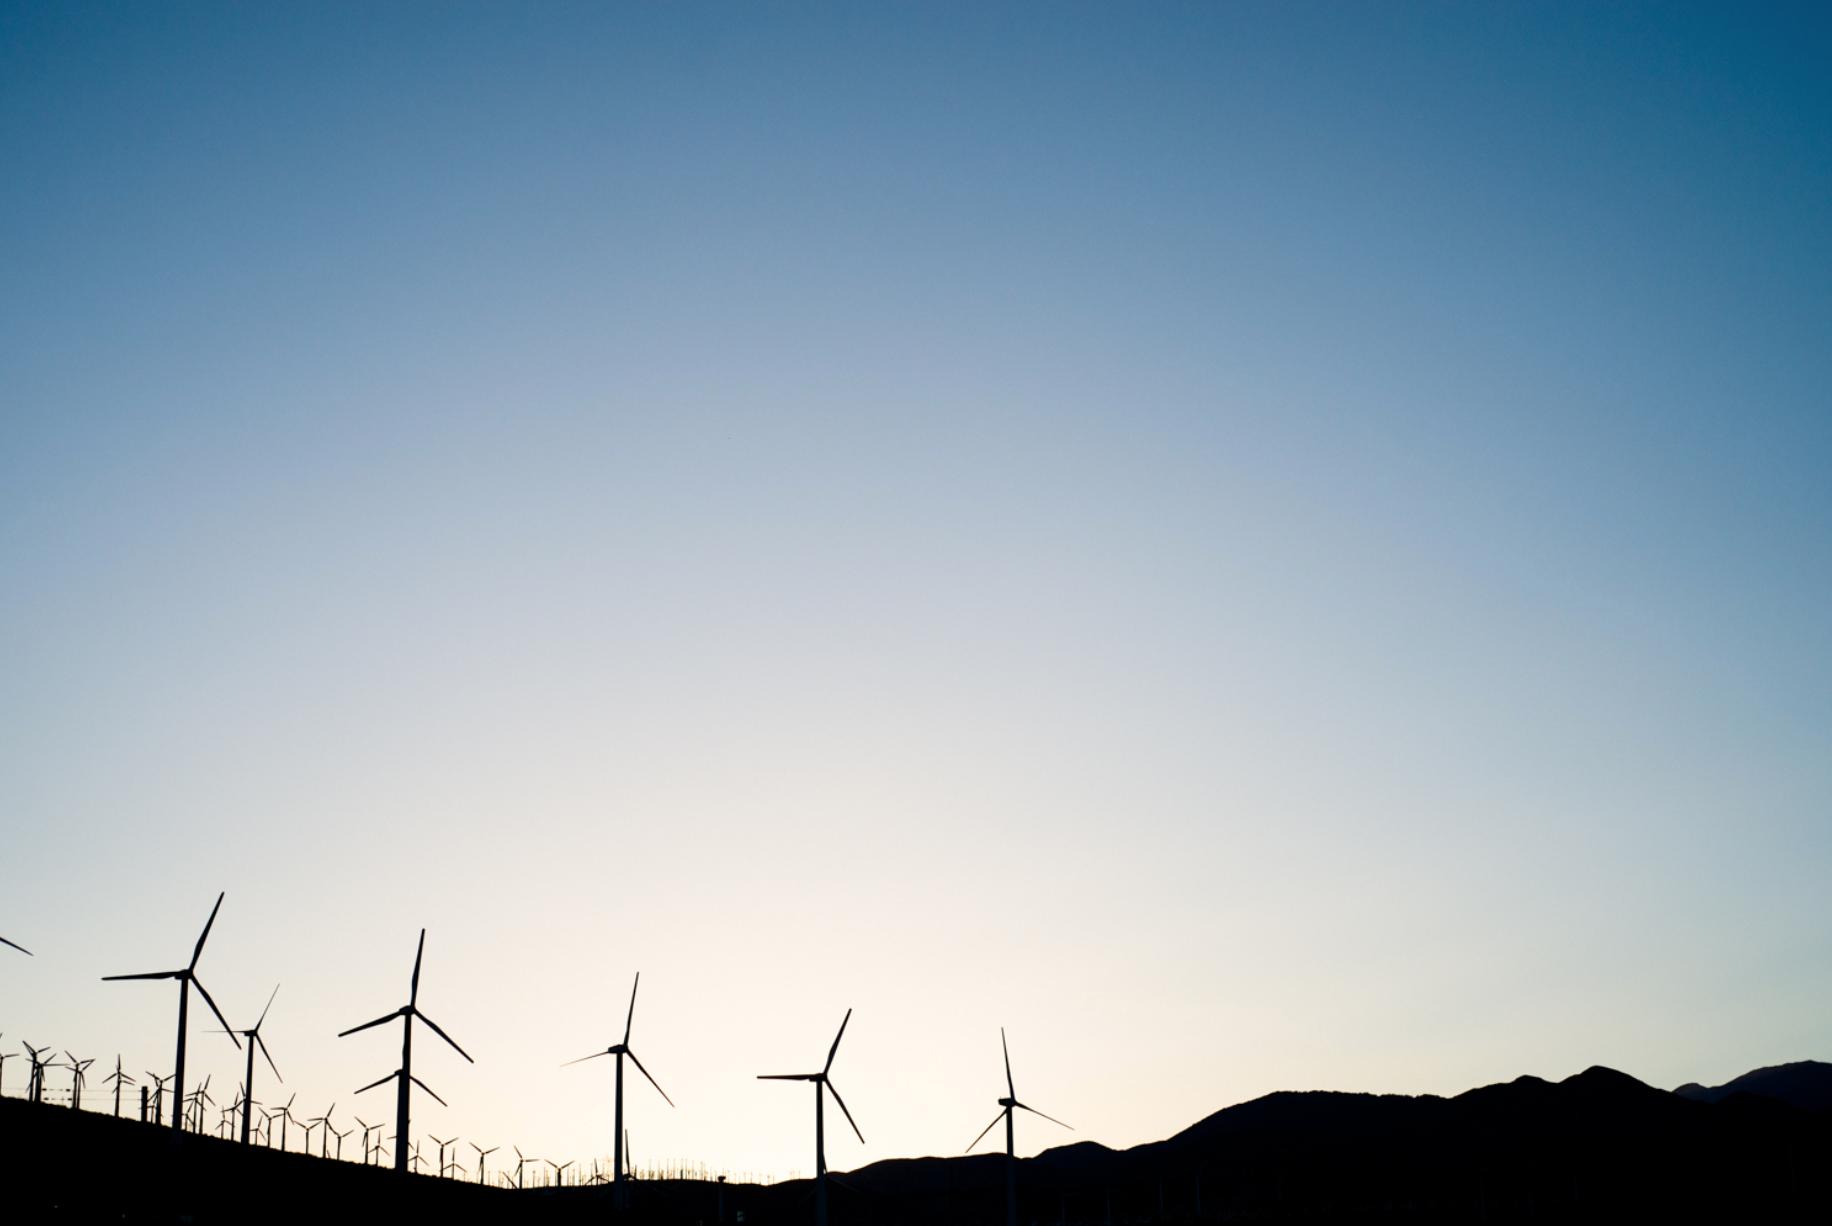 Windmills, image credit:  Sarah Dickenson